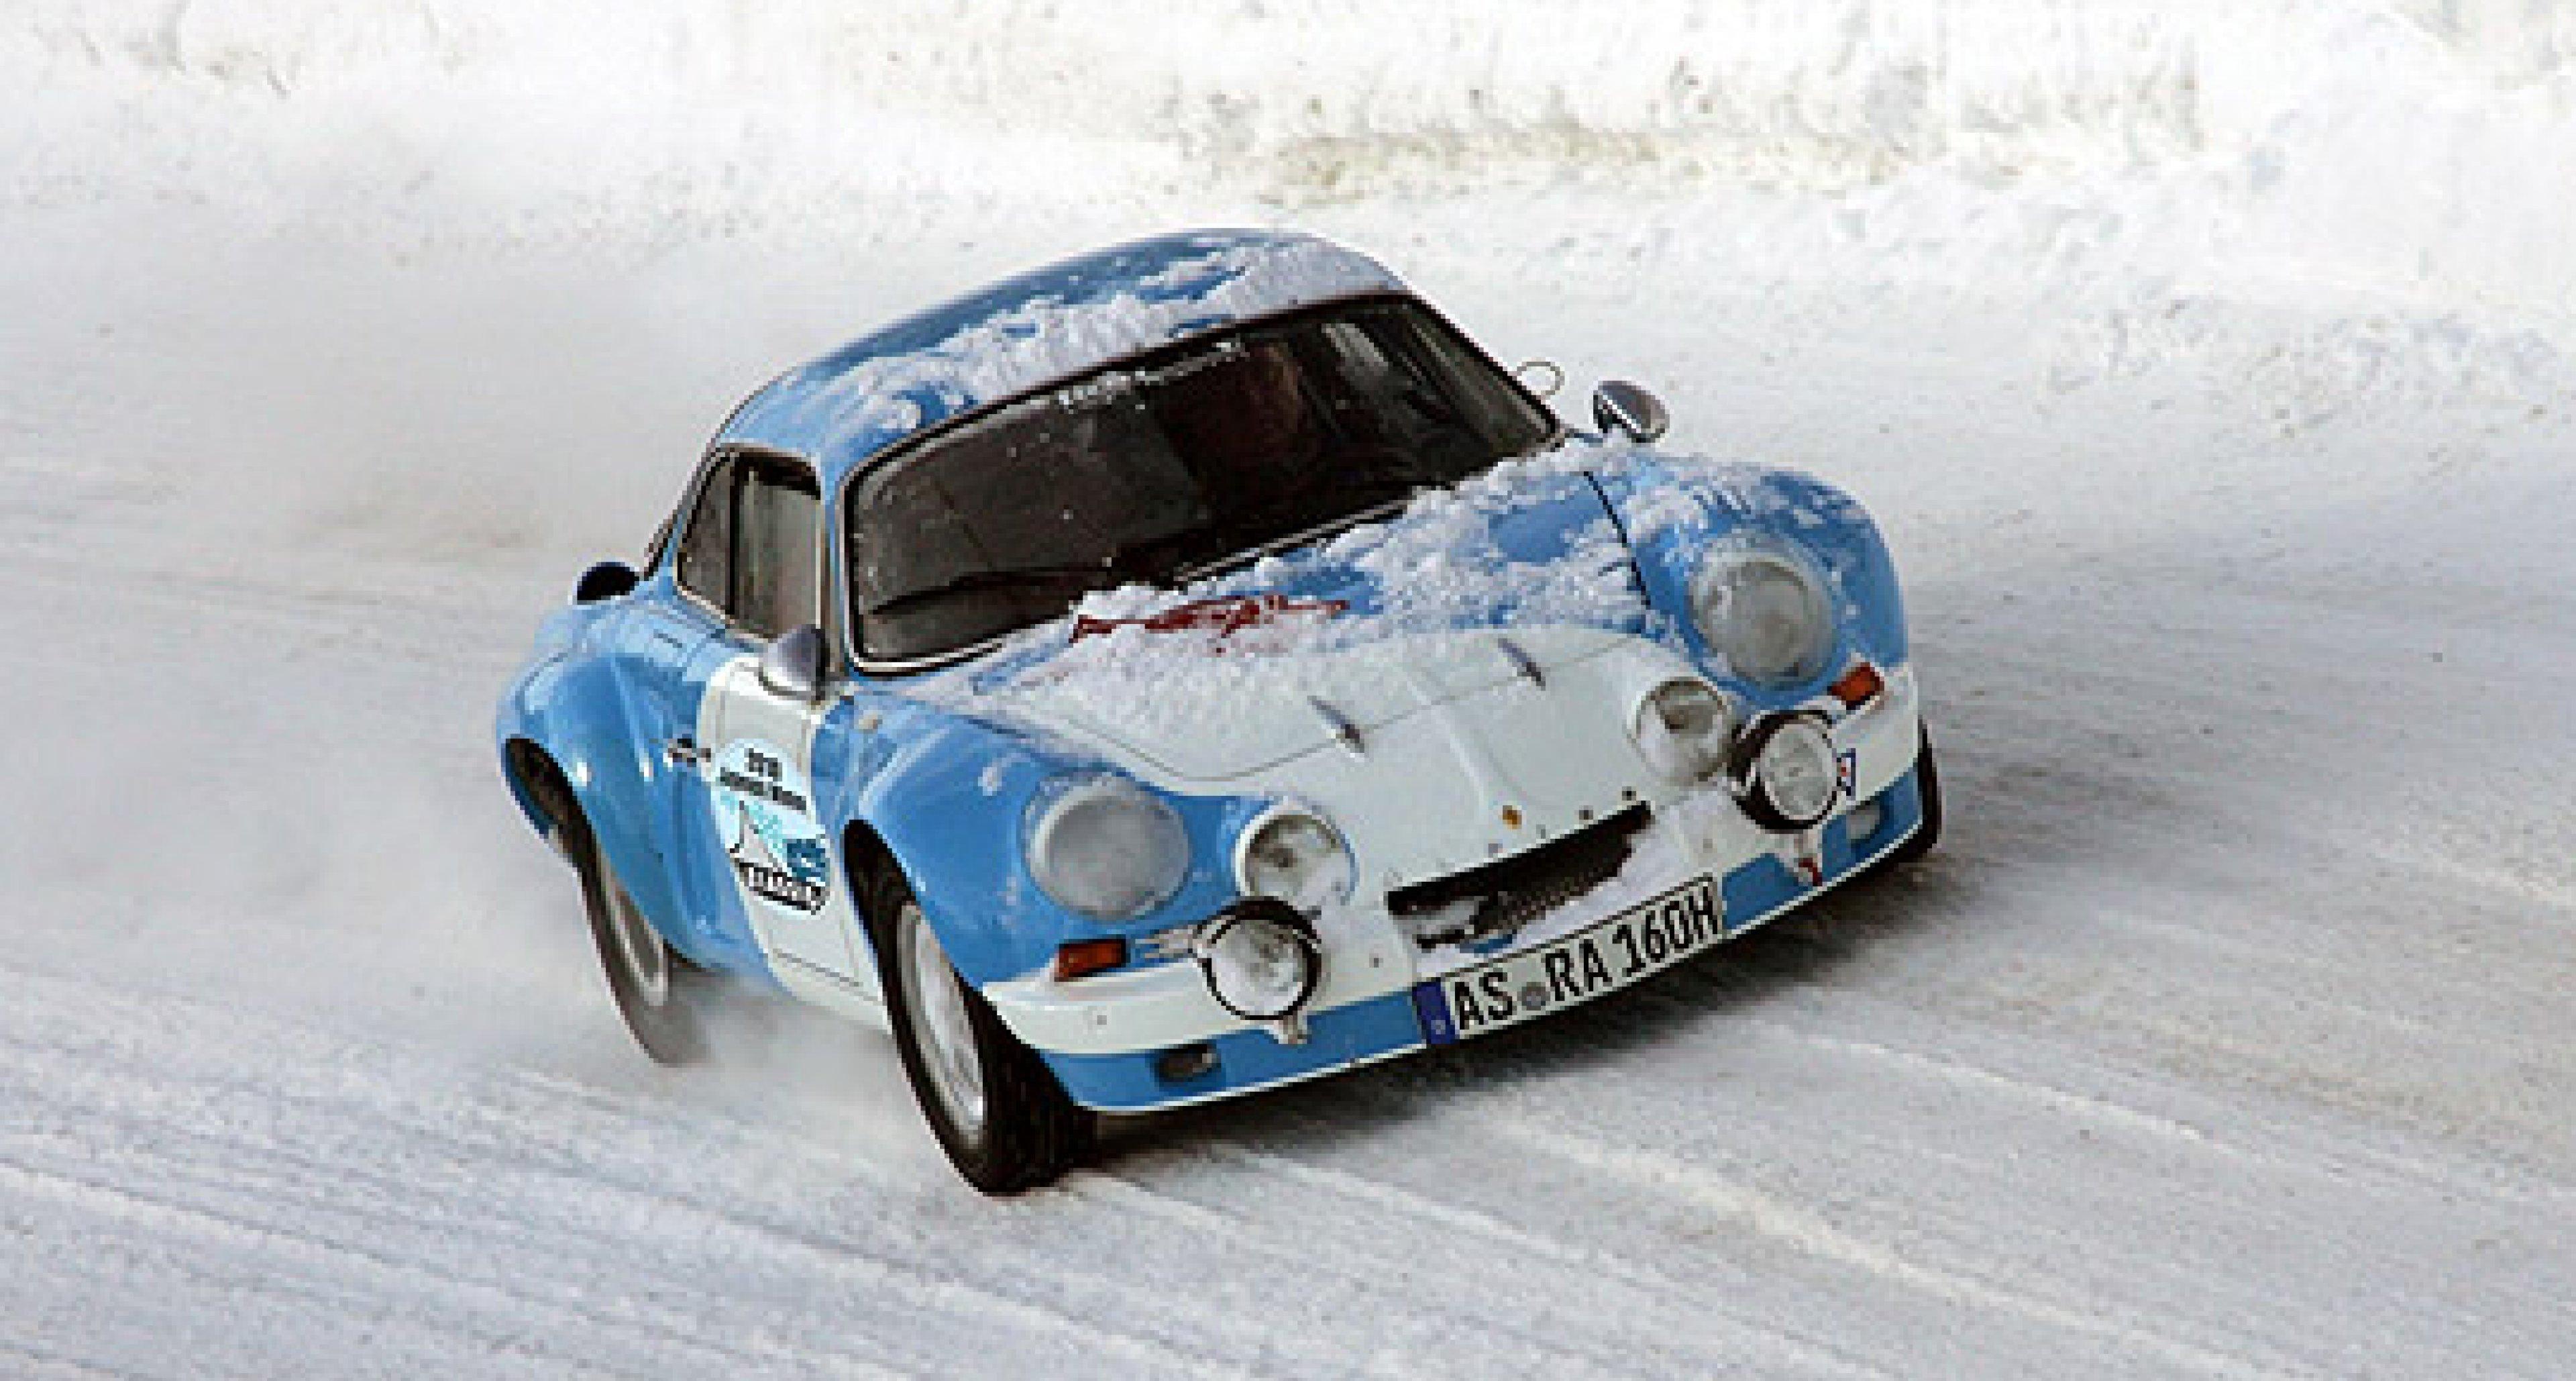 Legends Winter-Classic 2010: Neues Wintermärchen